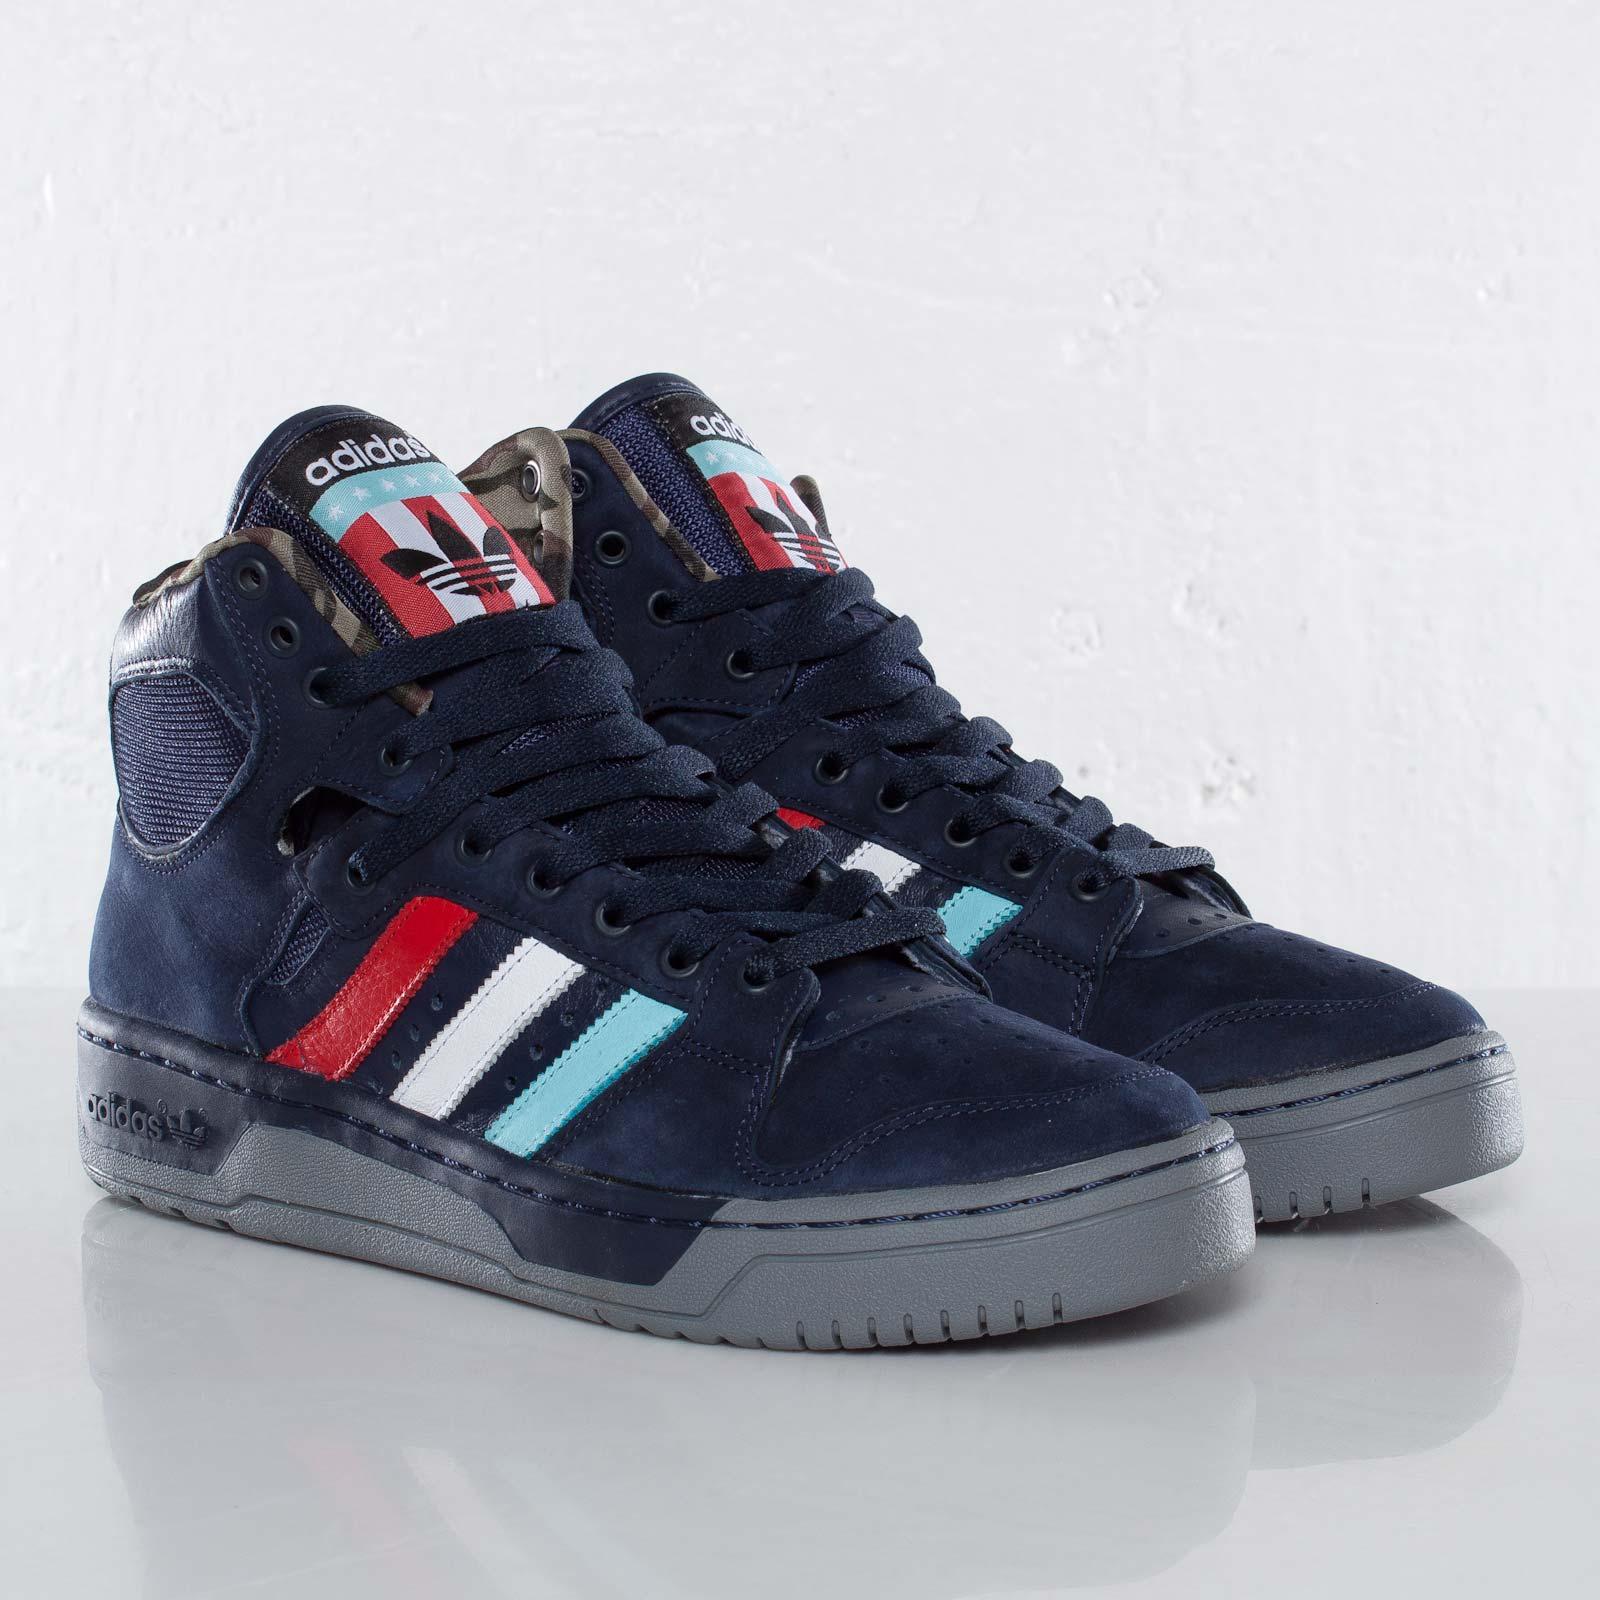 adidas Conductor Hi I Q32536 Sneakersnstuff Sneakers 53AjLRq4